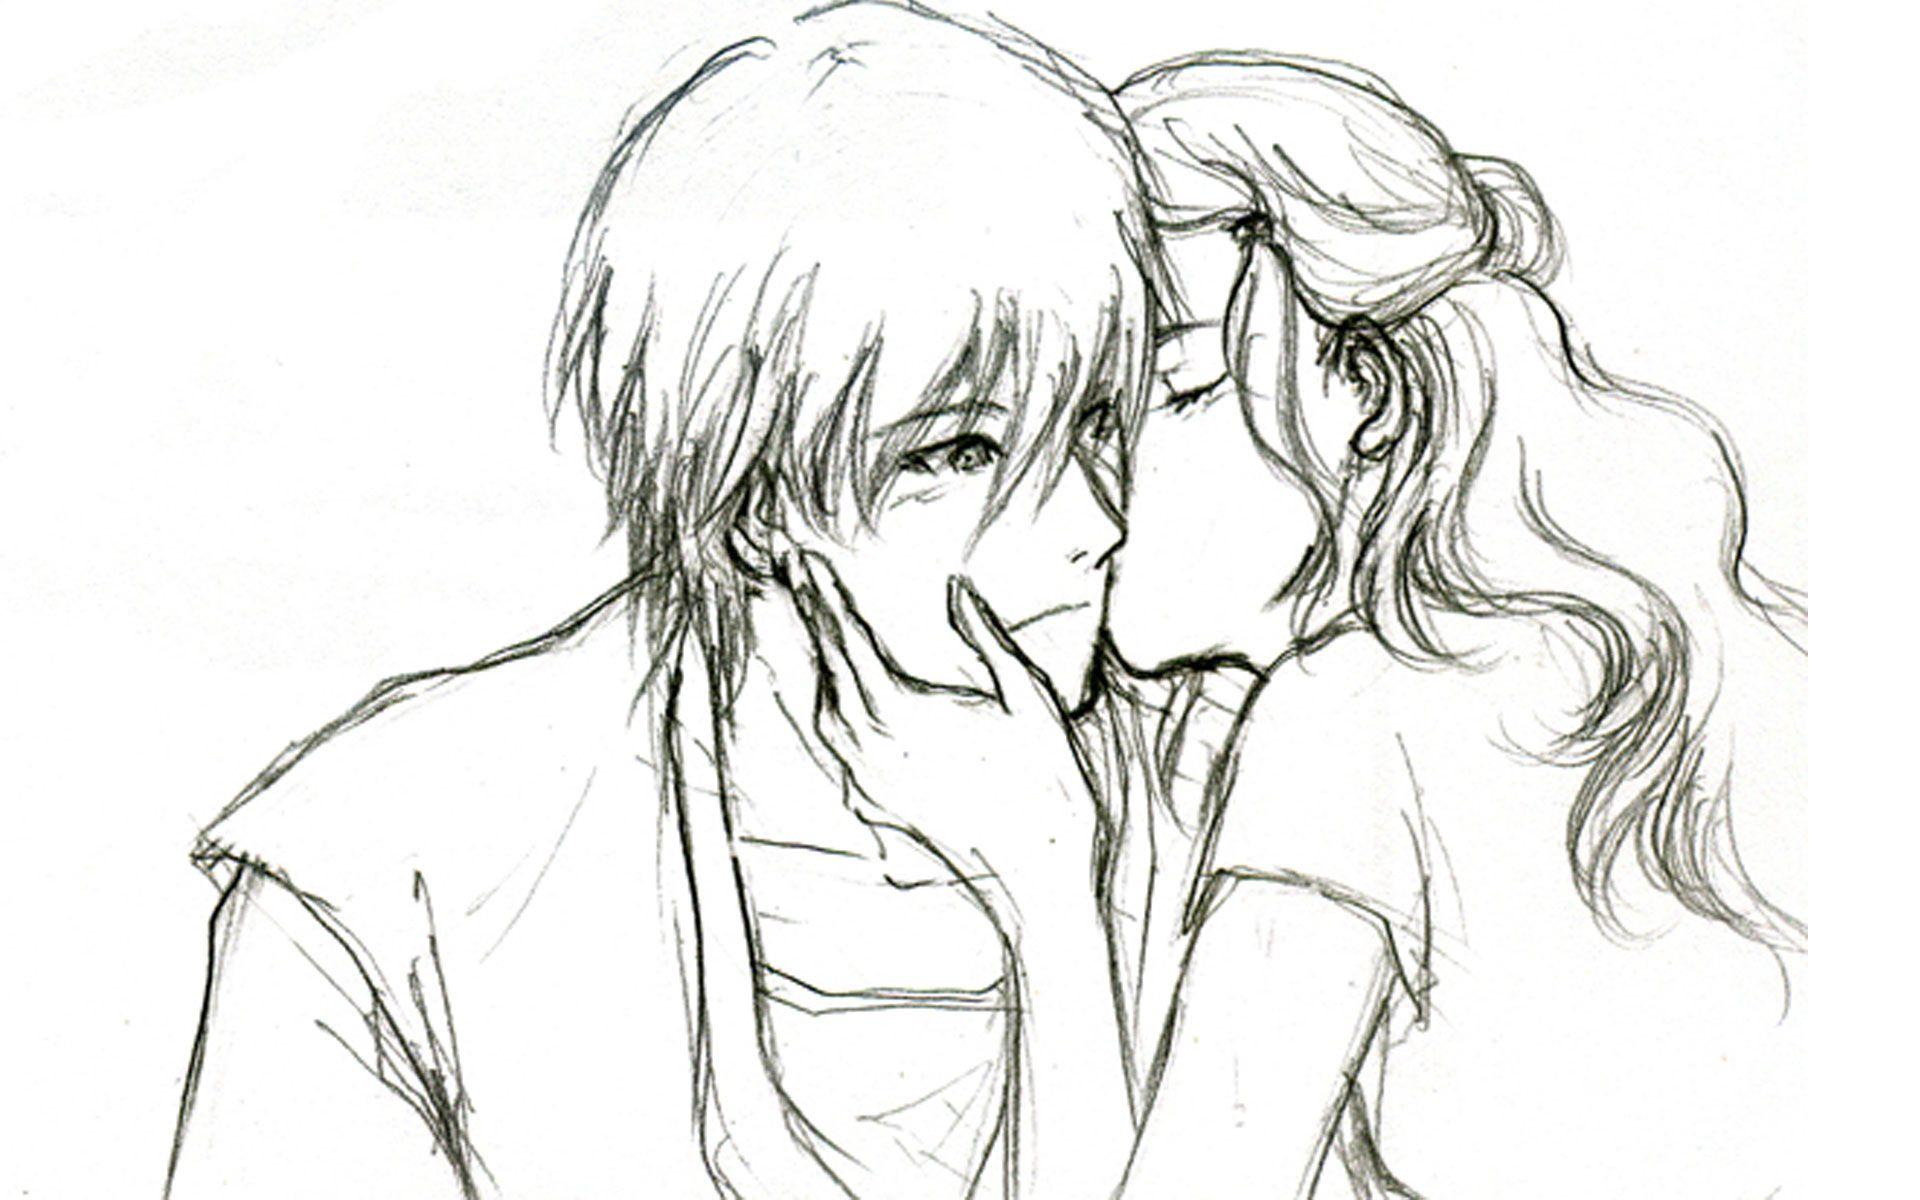 Cute Love Drawings Dr Odd Cute Couple Drawings Drawings For Him Drawings Of Friends